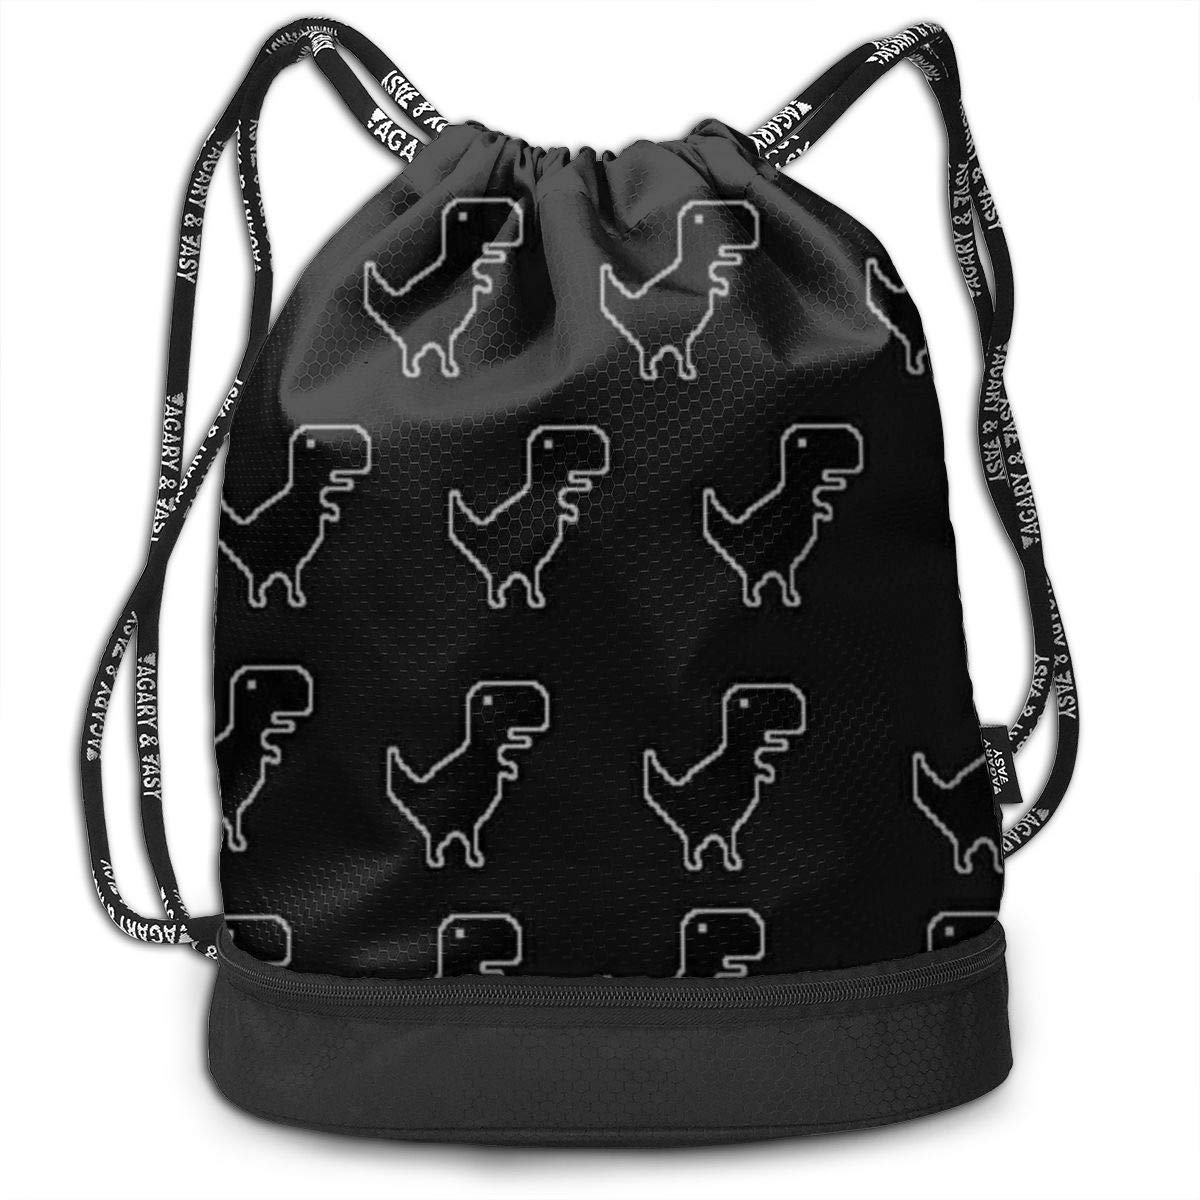 Lightweight Waterproof Large Storage Drawstring Bag For Men /& Women Dinosaur Pattern Cinch Backpack Sackpack Tote Sack